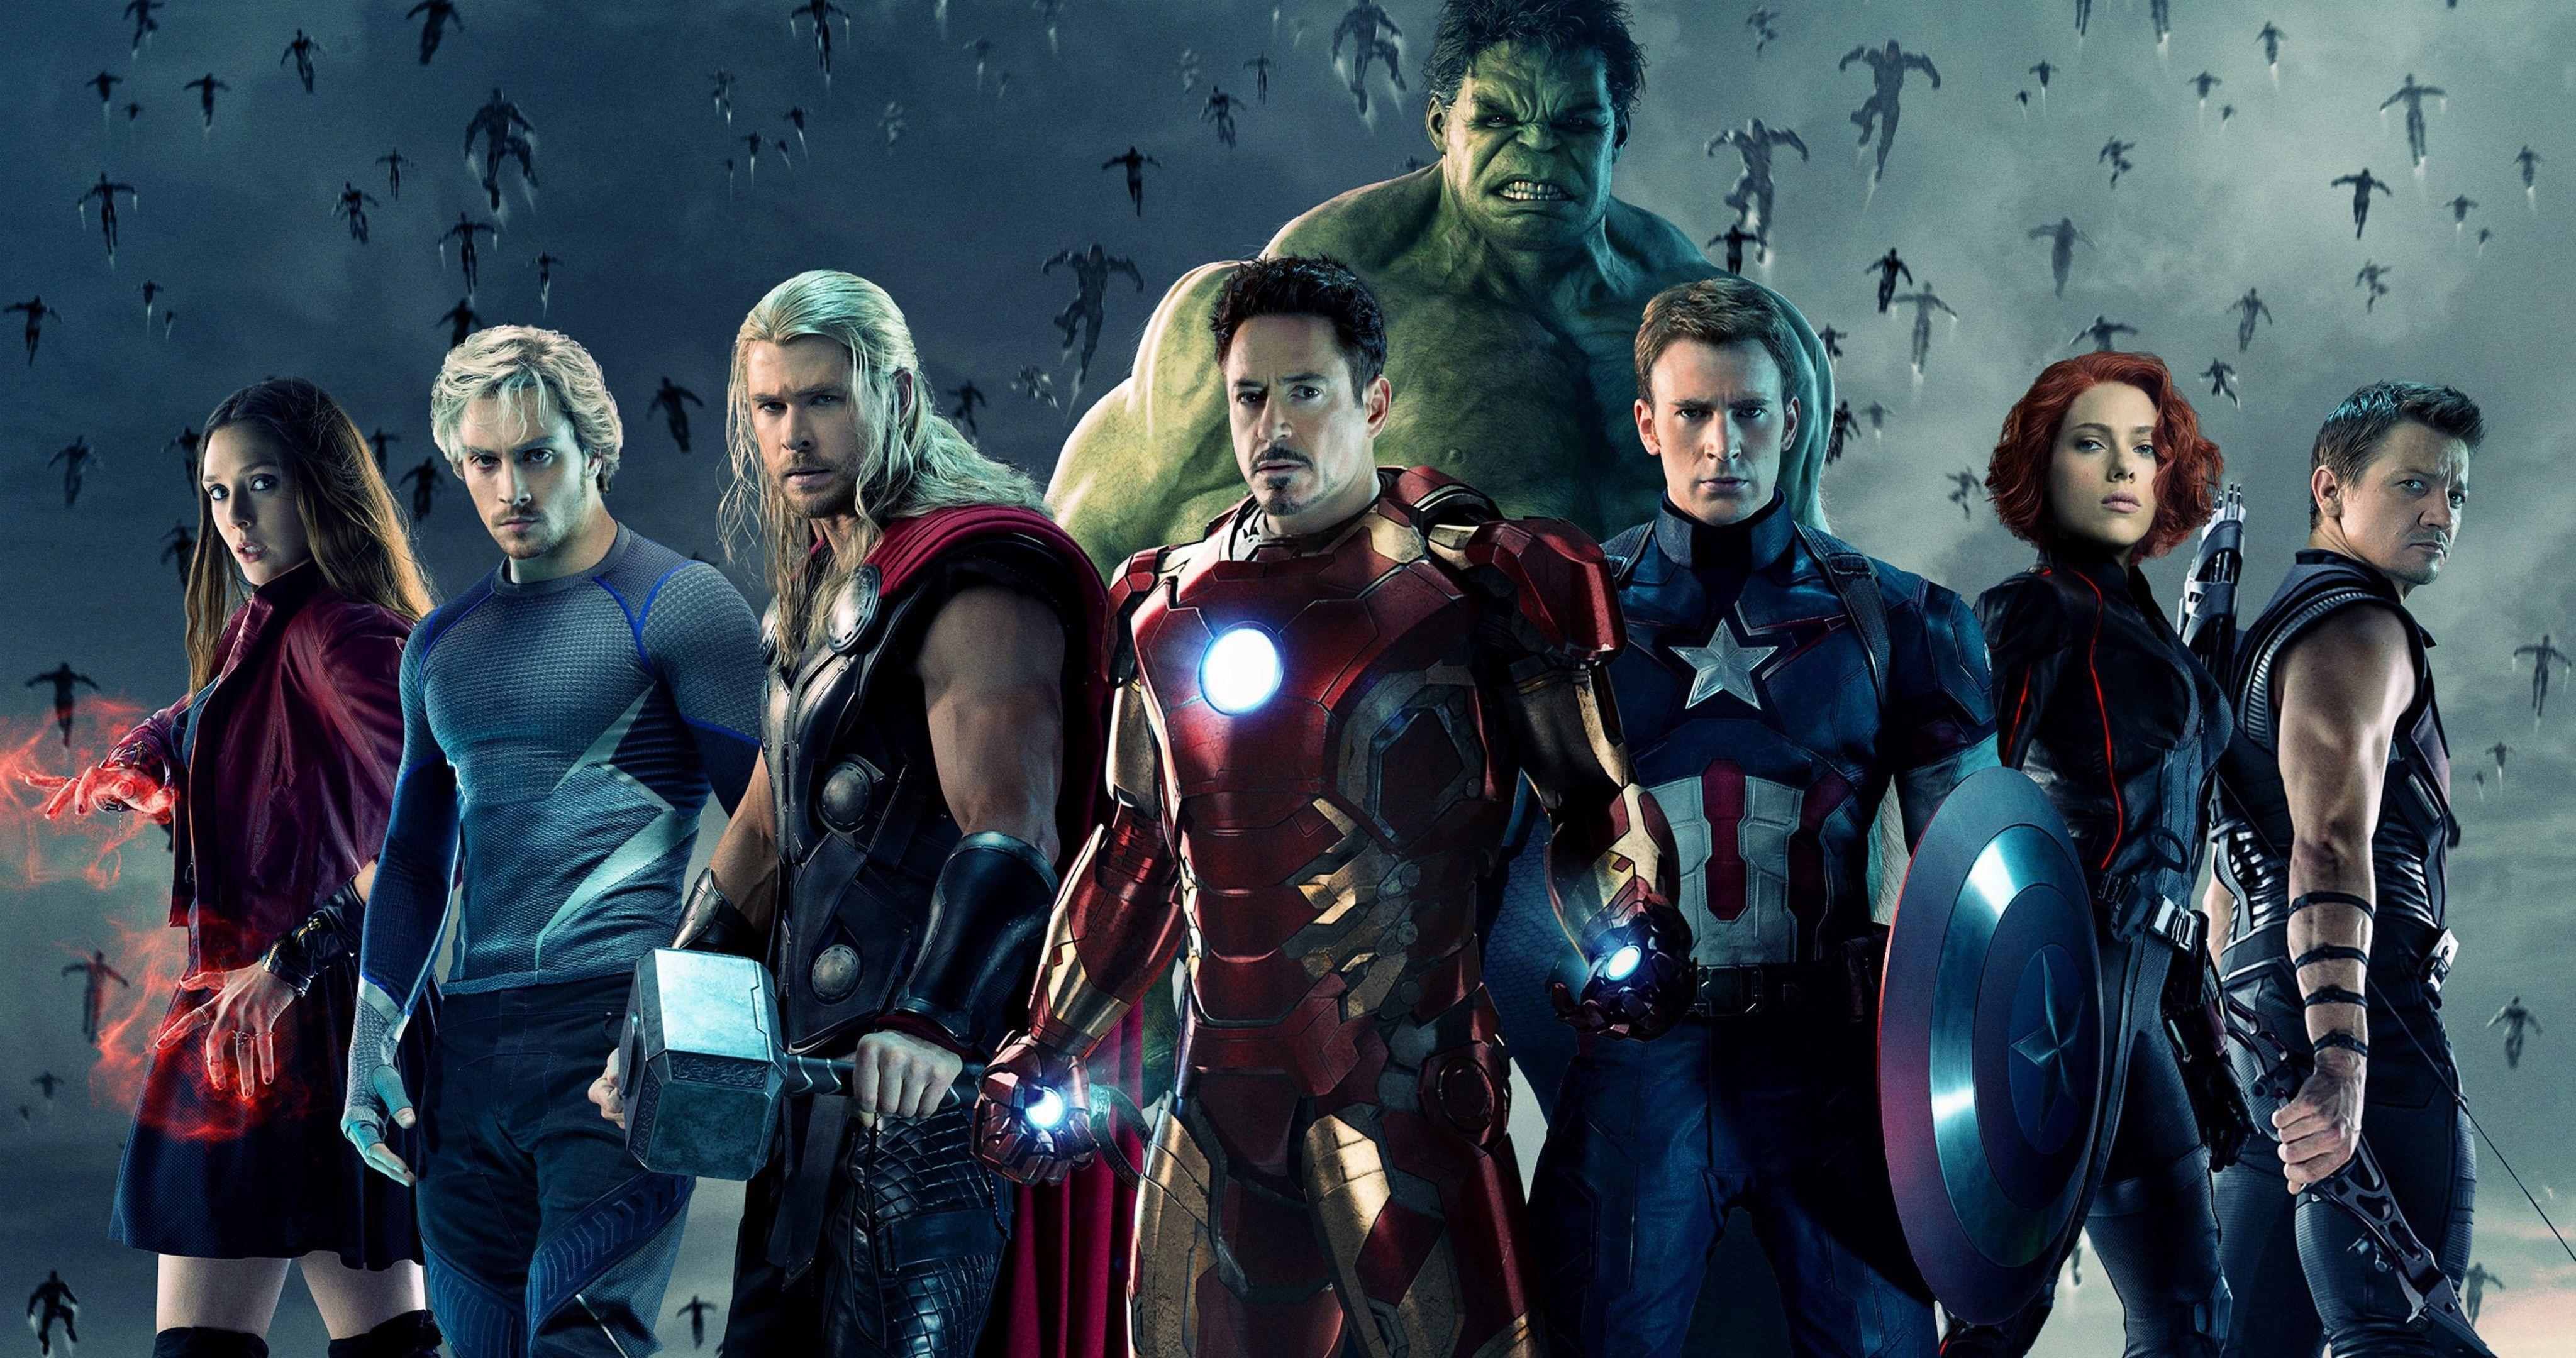 Avengers 4k Ultra Hd Wallpapers Top Free Avengers 4k Ultra Hd Backgrounds Wallpaperaccess